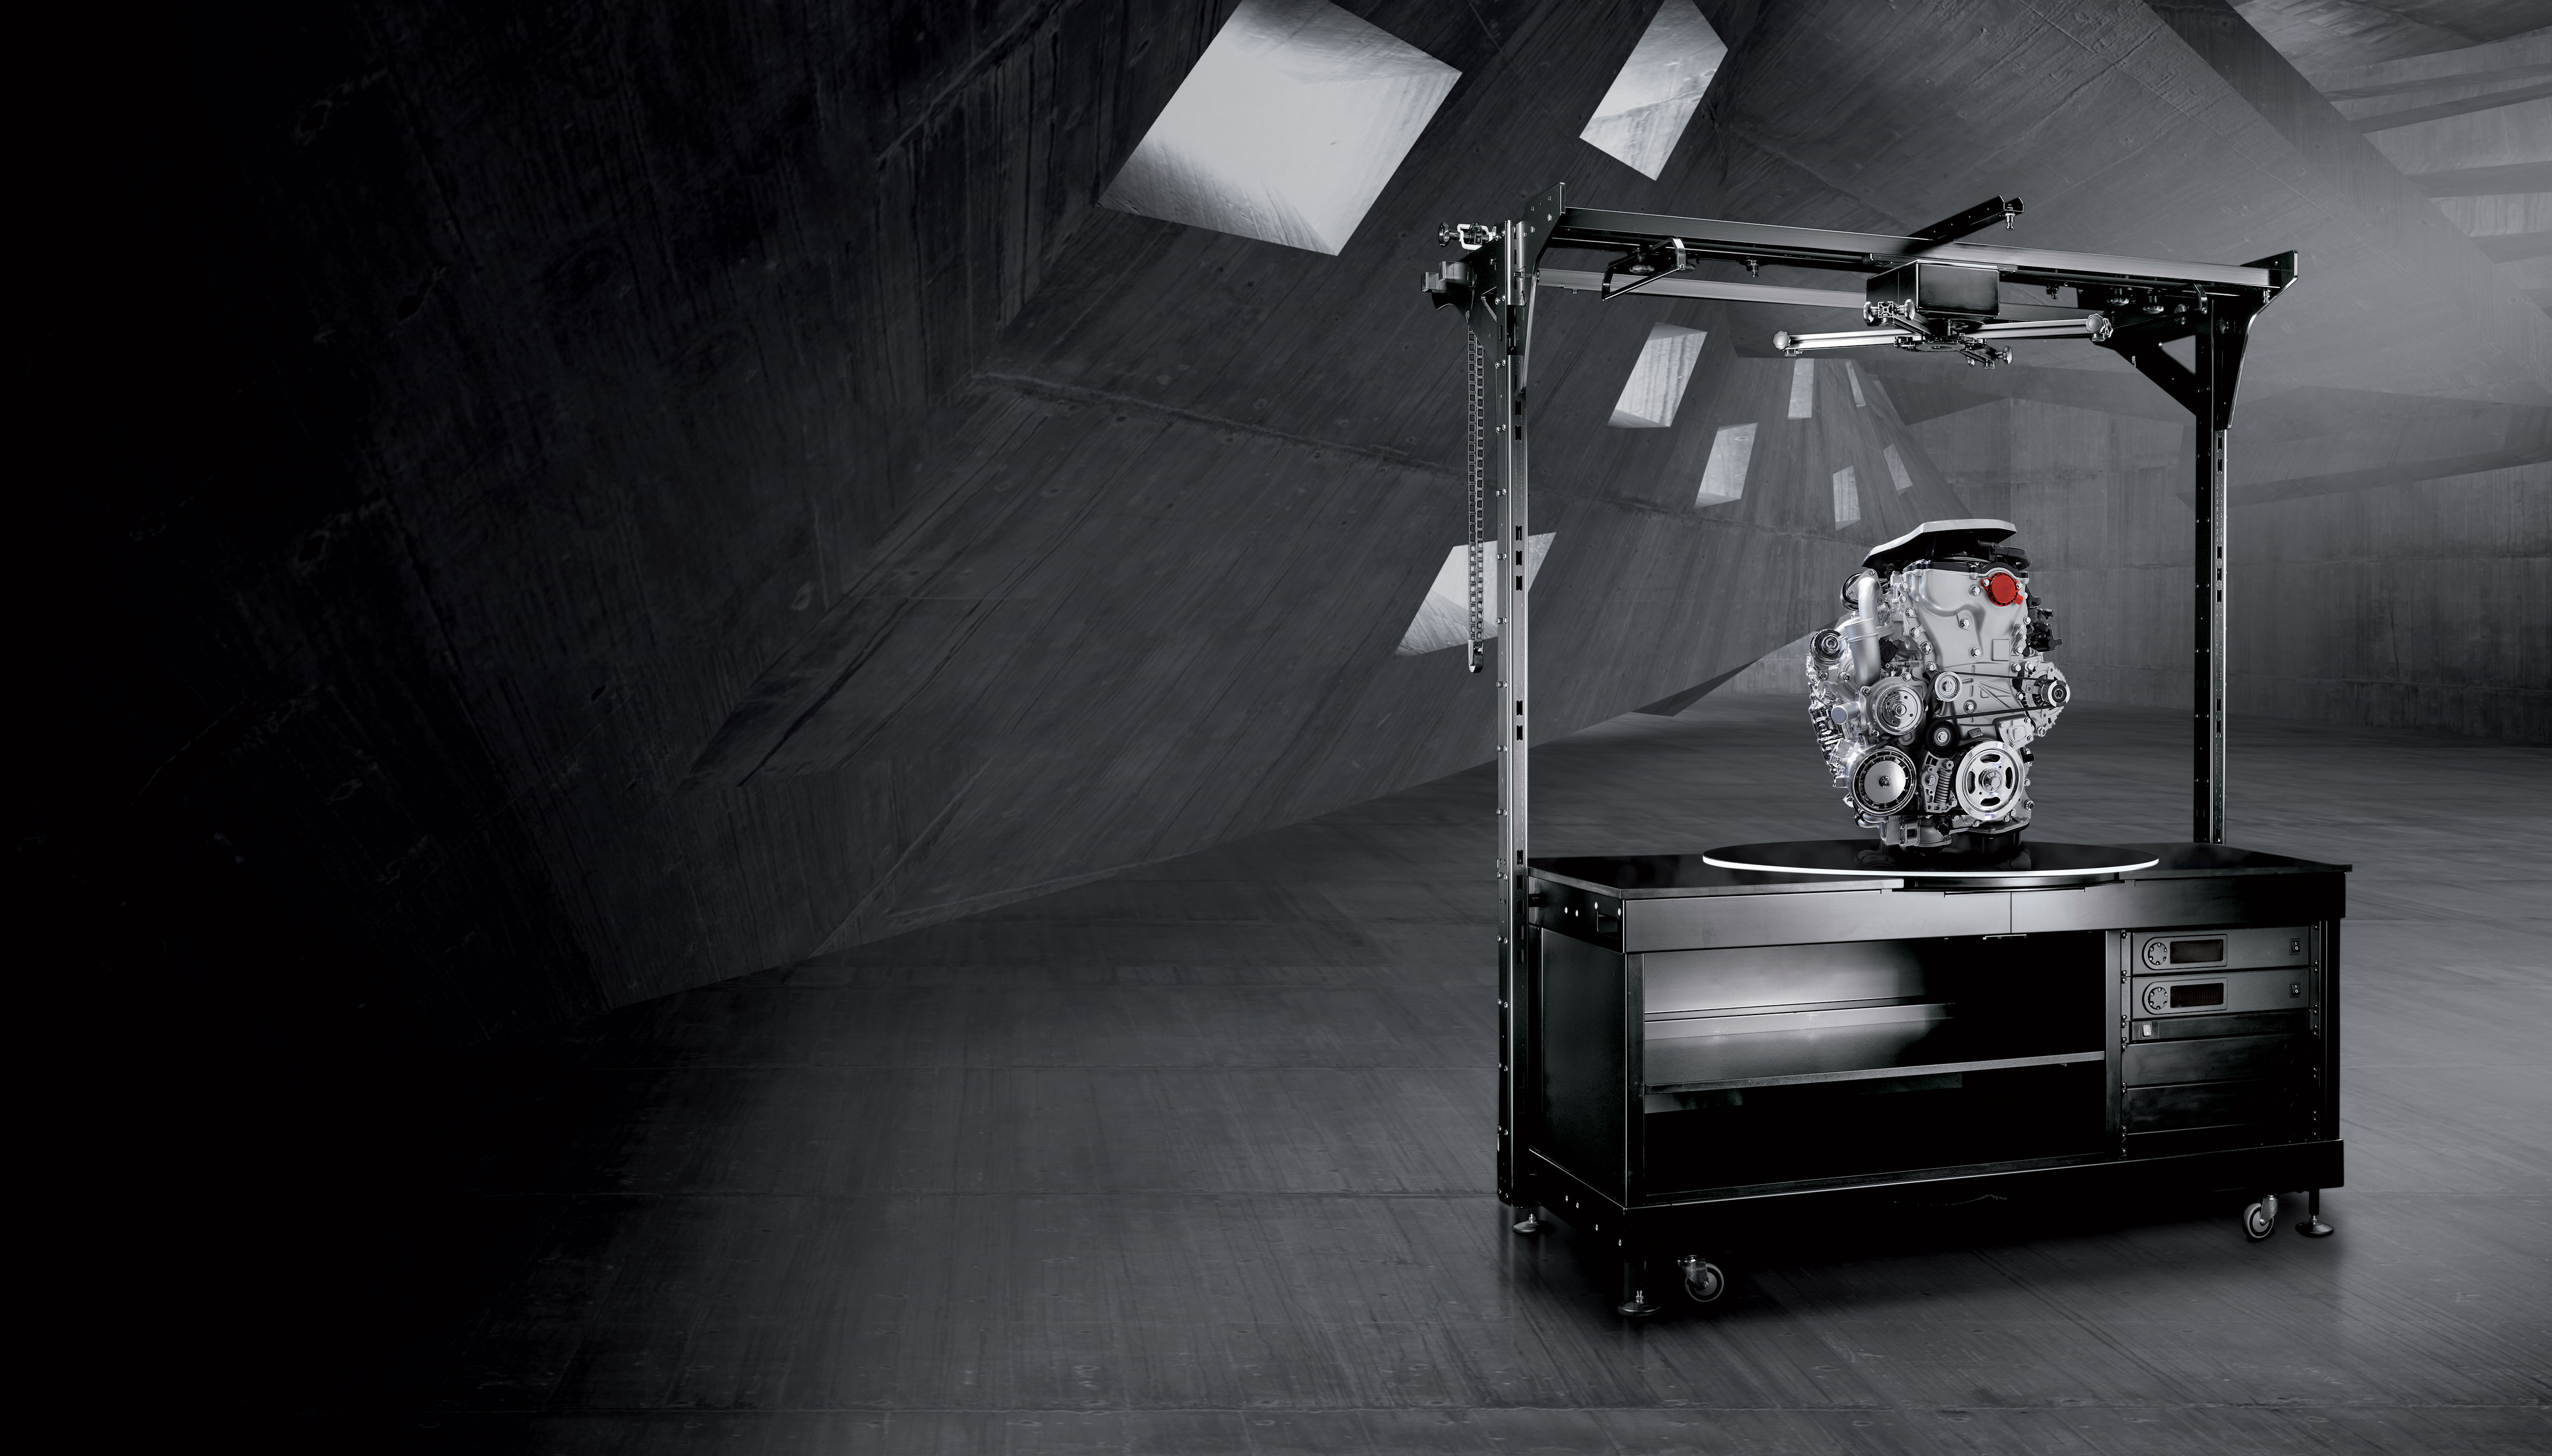 PhotoRobot الثقيلة واجب الروبوتية القرص الدوار أثناء اطلاق النار على المحرك الثقيل